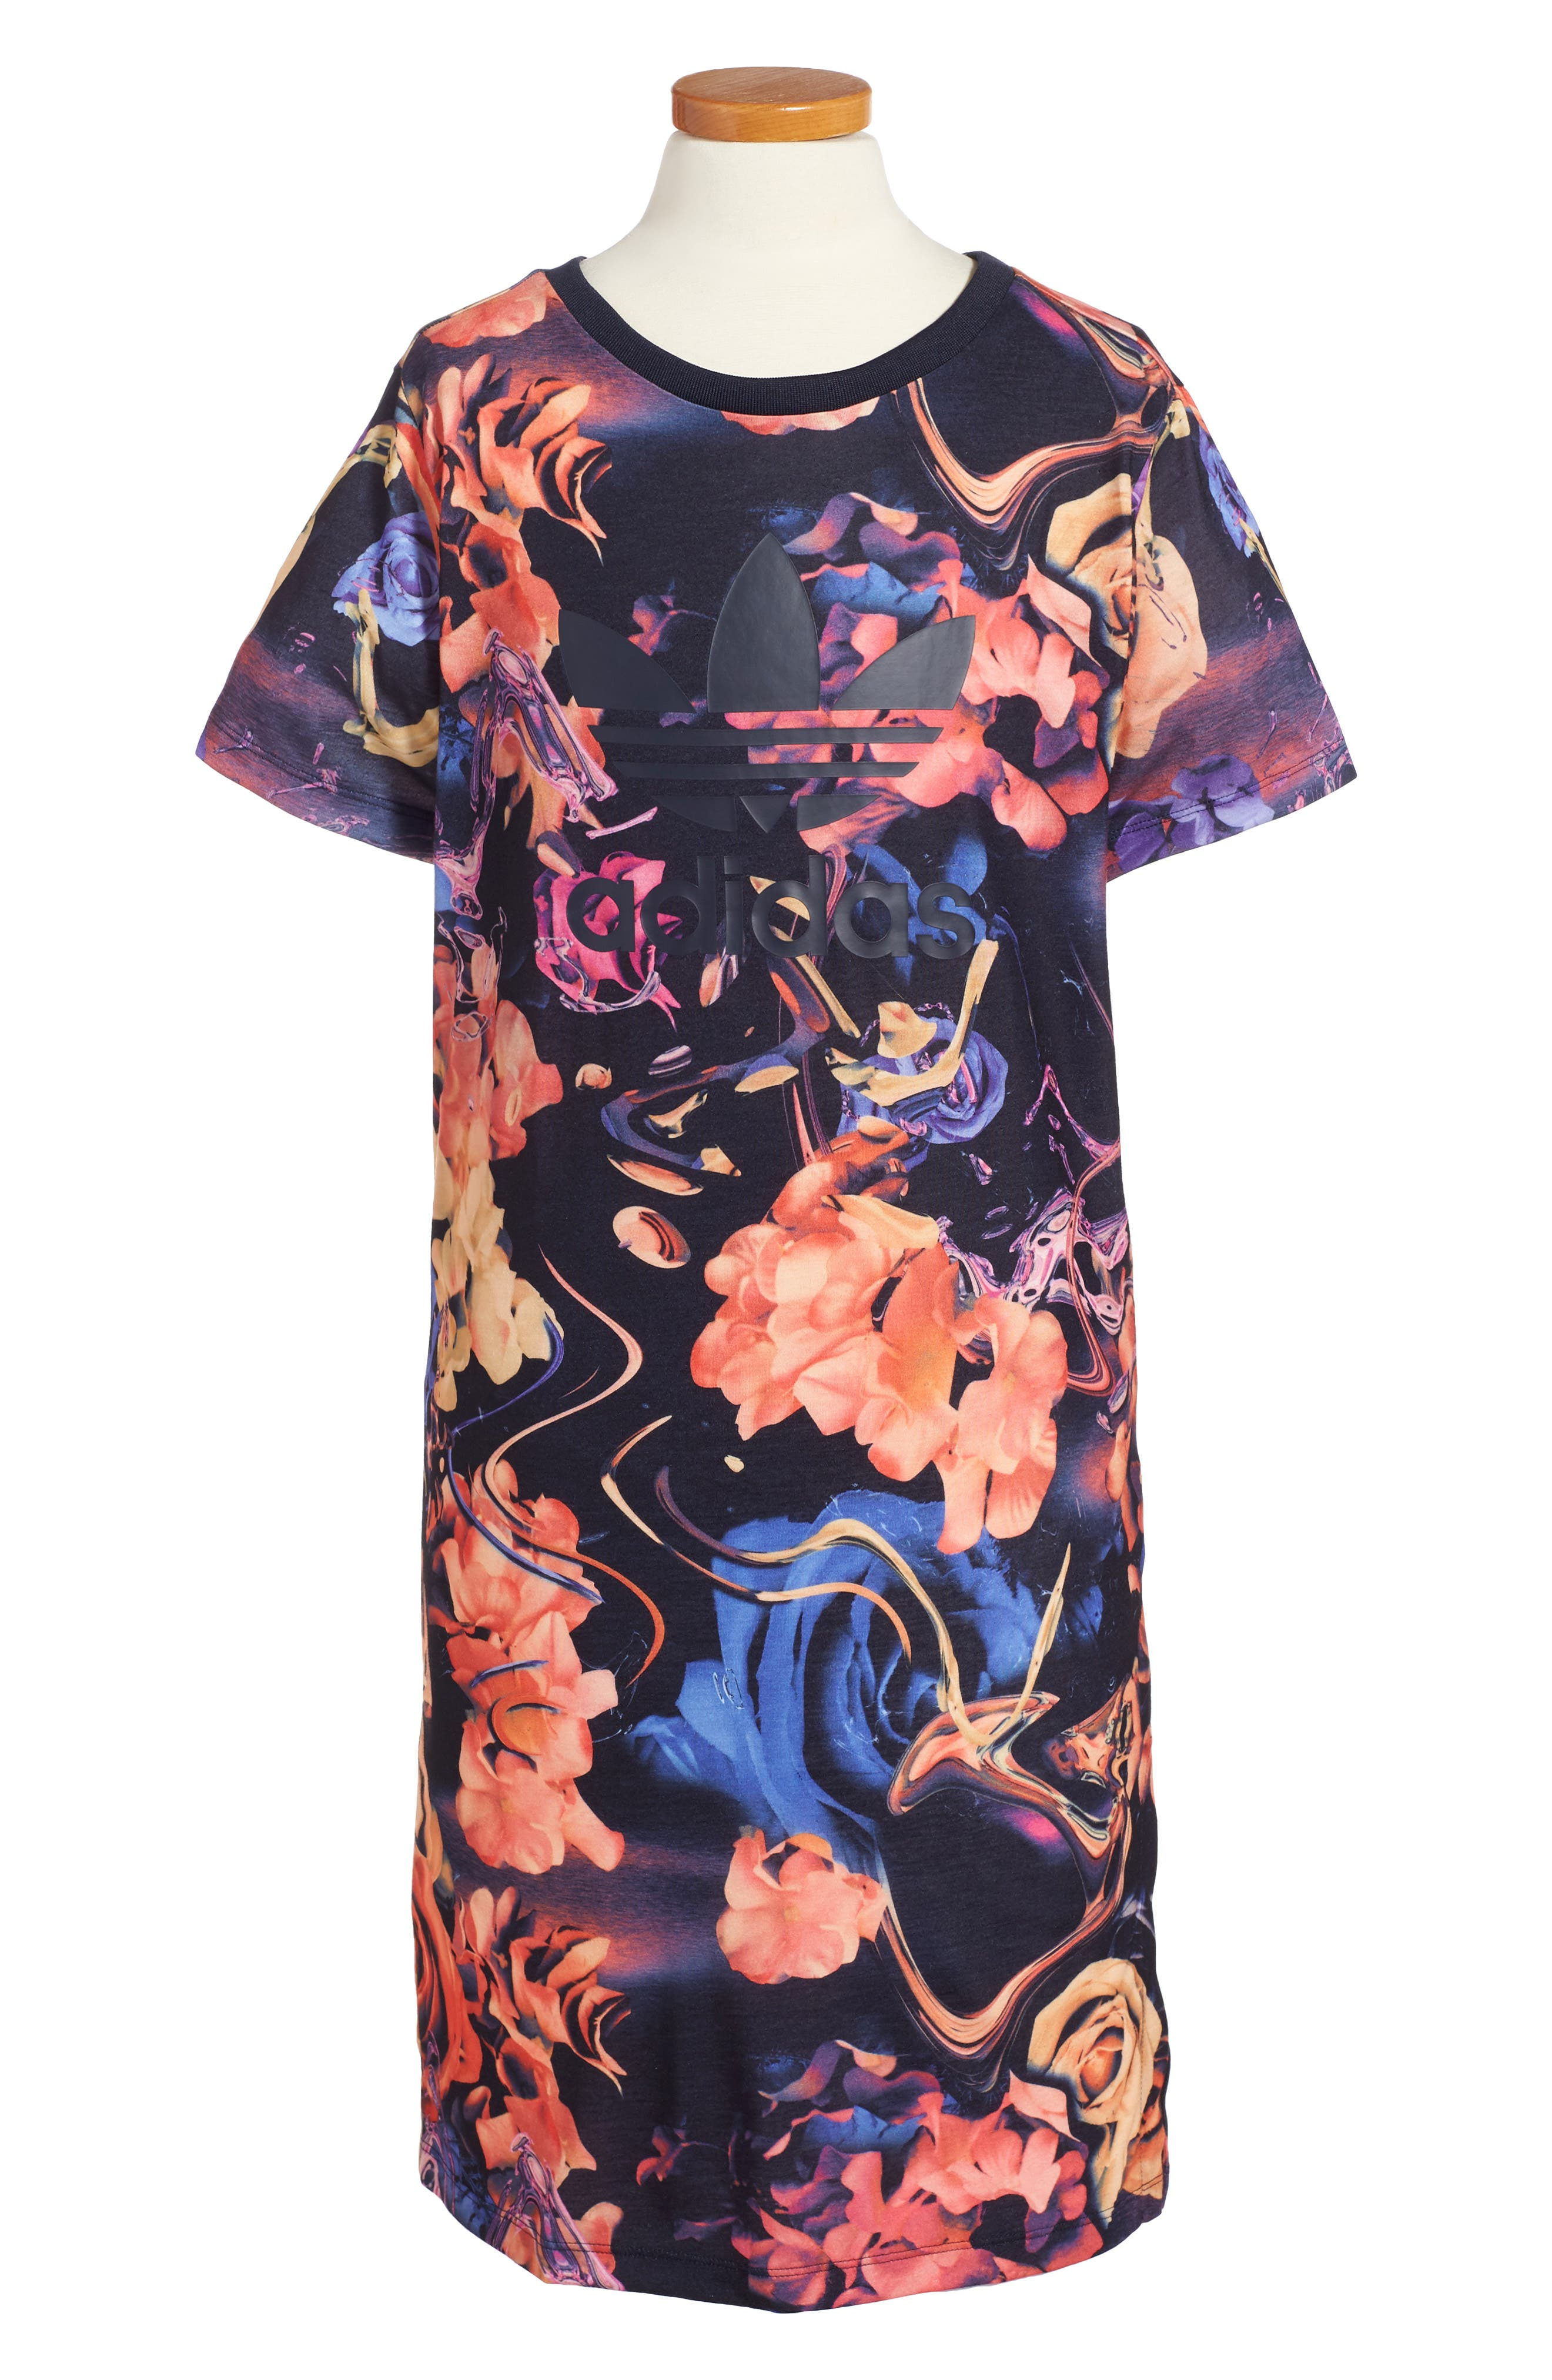 Main Image - adidas Originals Rose Print T-Shirt Dress (Big Girls)